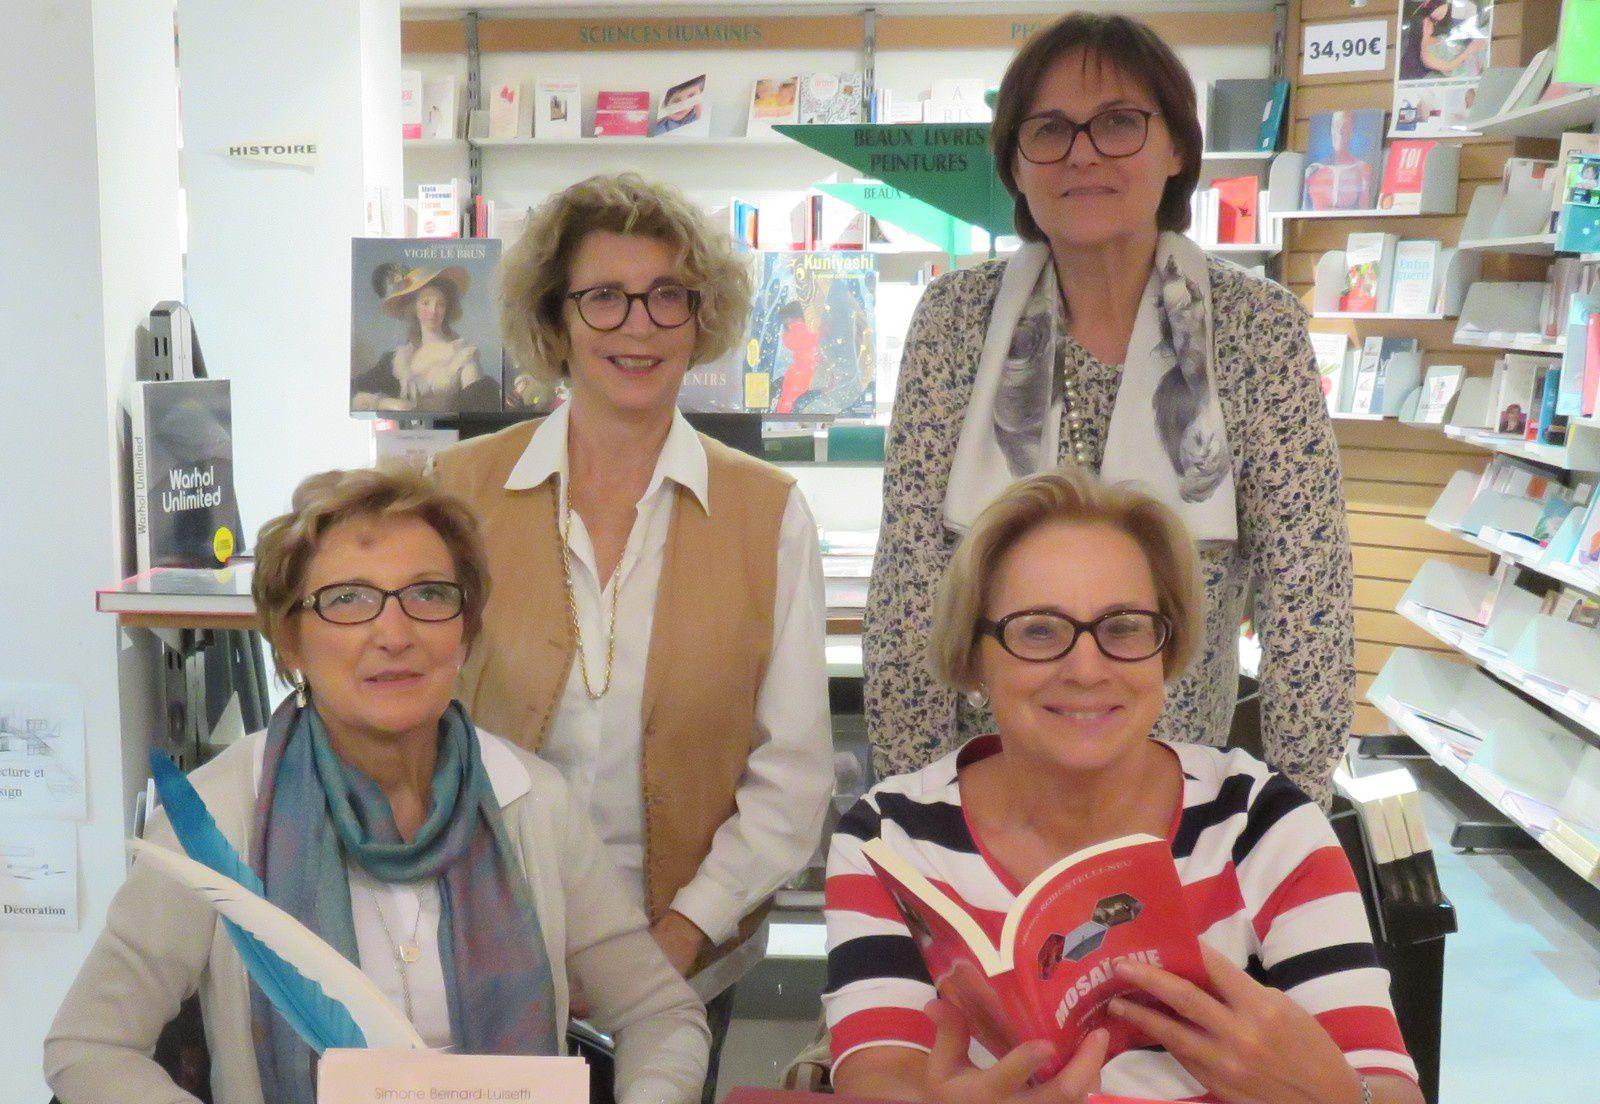 De bas en haut et de gauche à droite : Simone Luisetti - Martine Robustelli Neu - Jeannine Anziani - Nicole Delor